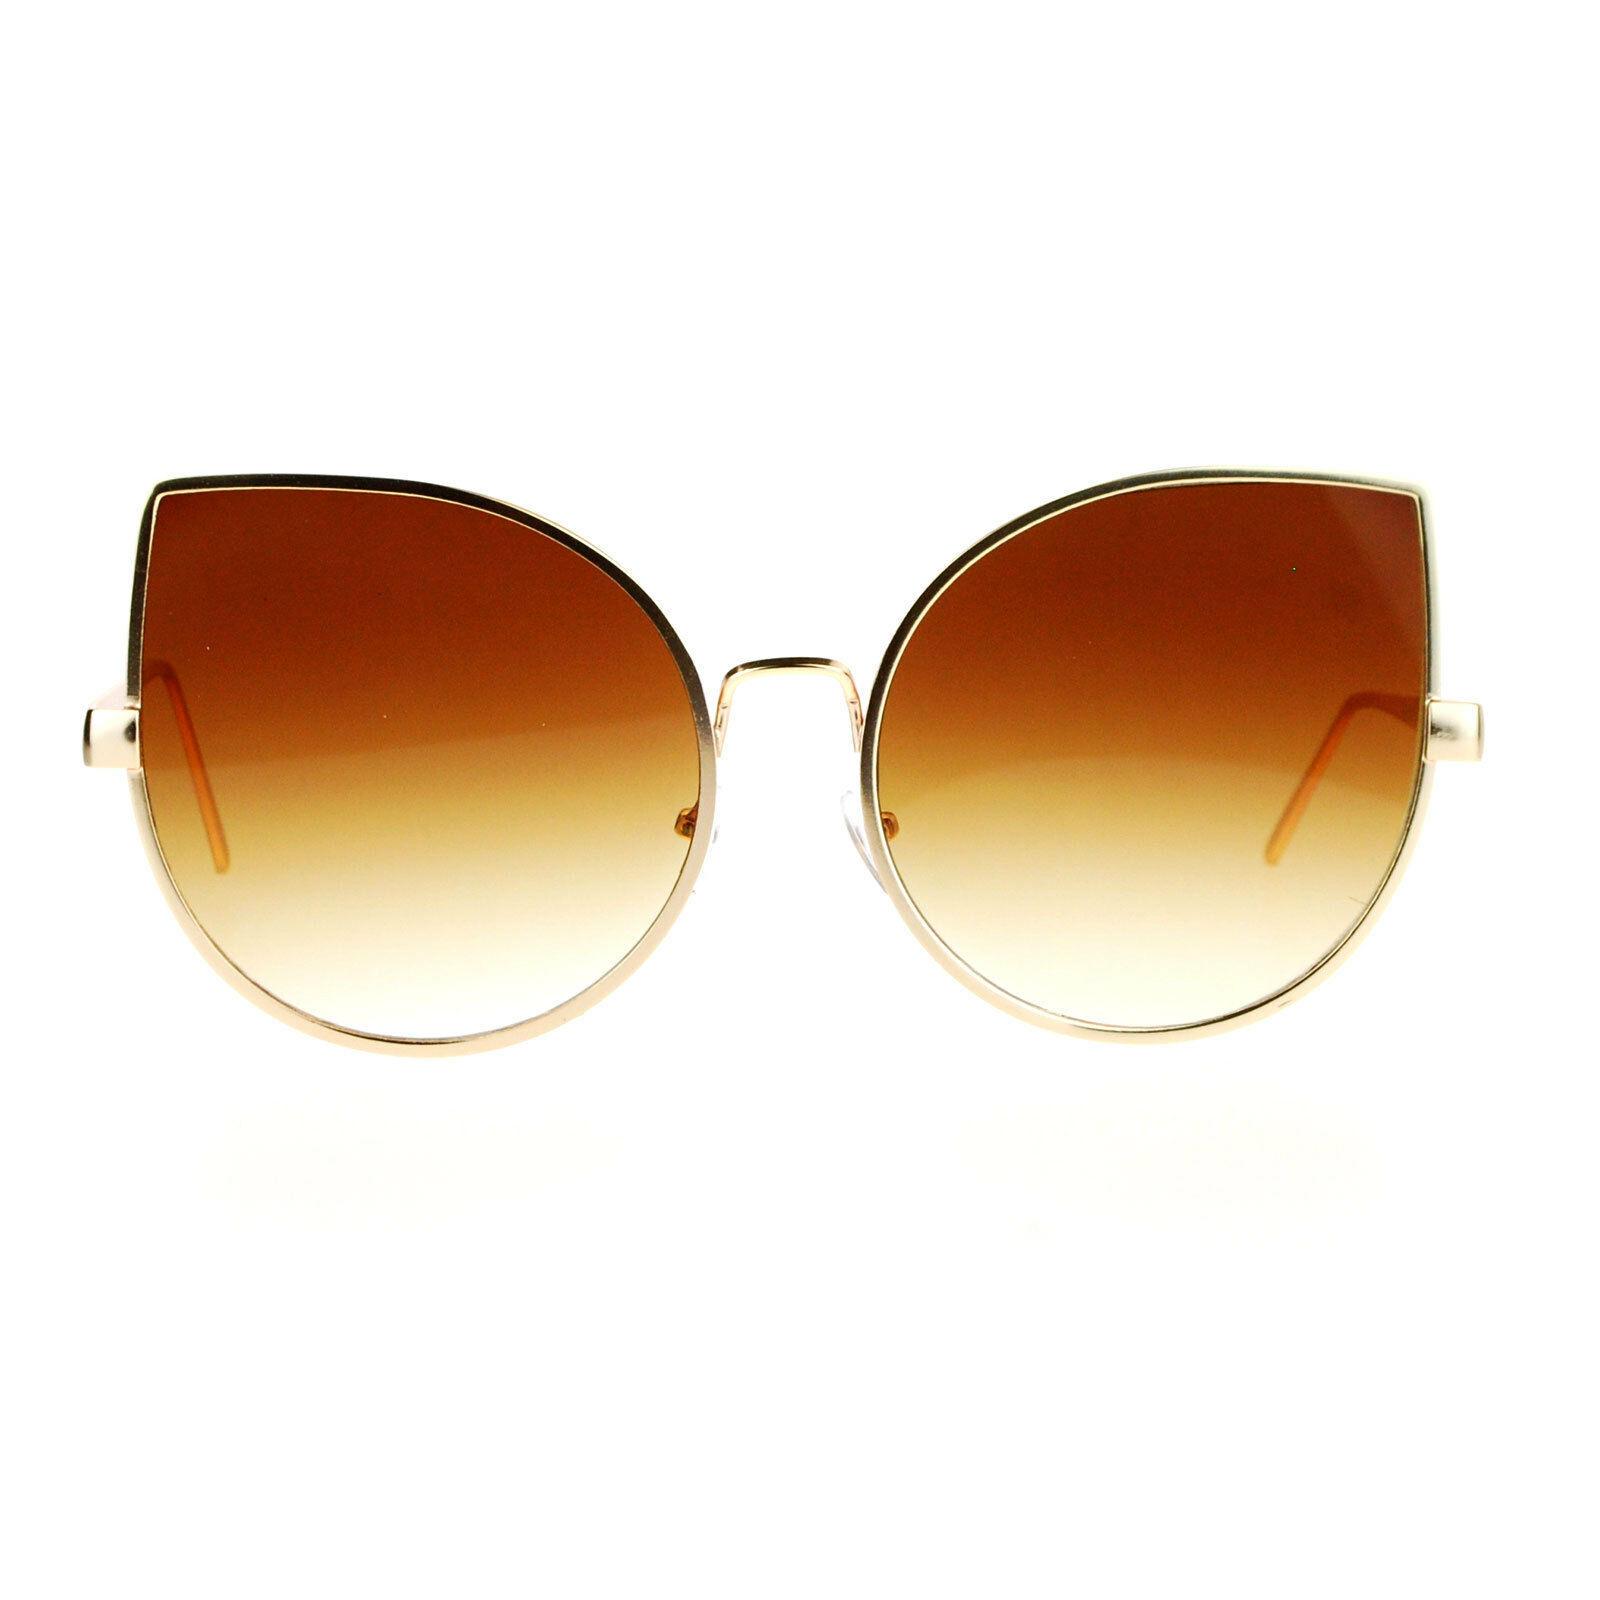 Super Oversized Sunglasses Foxy Round Cateye Flat Lens Womens Fashion Shades